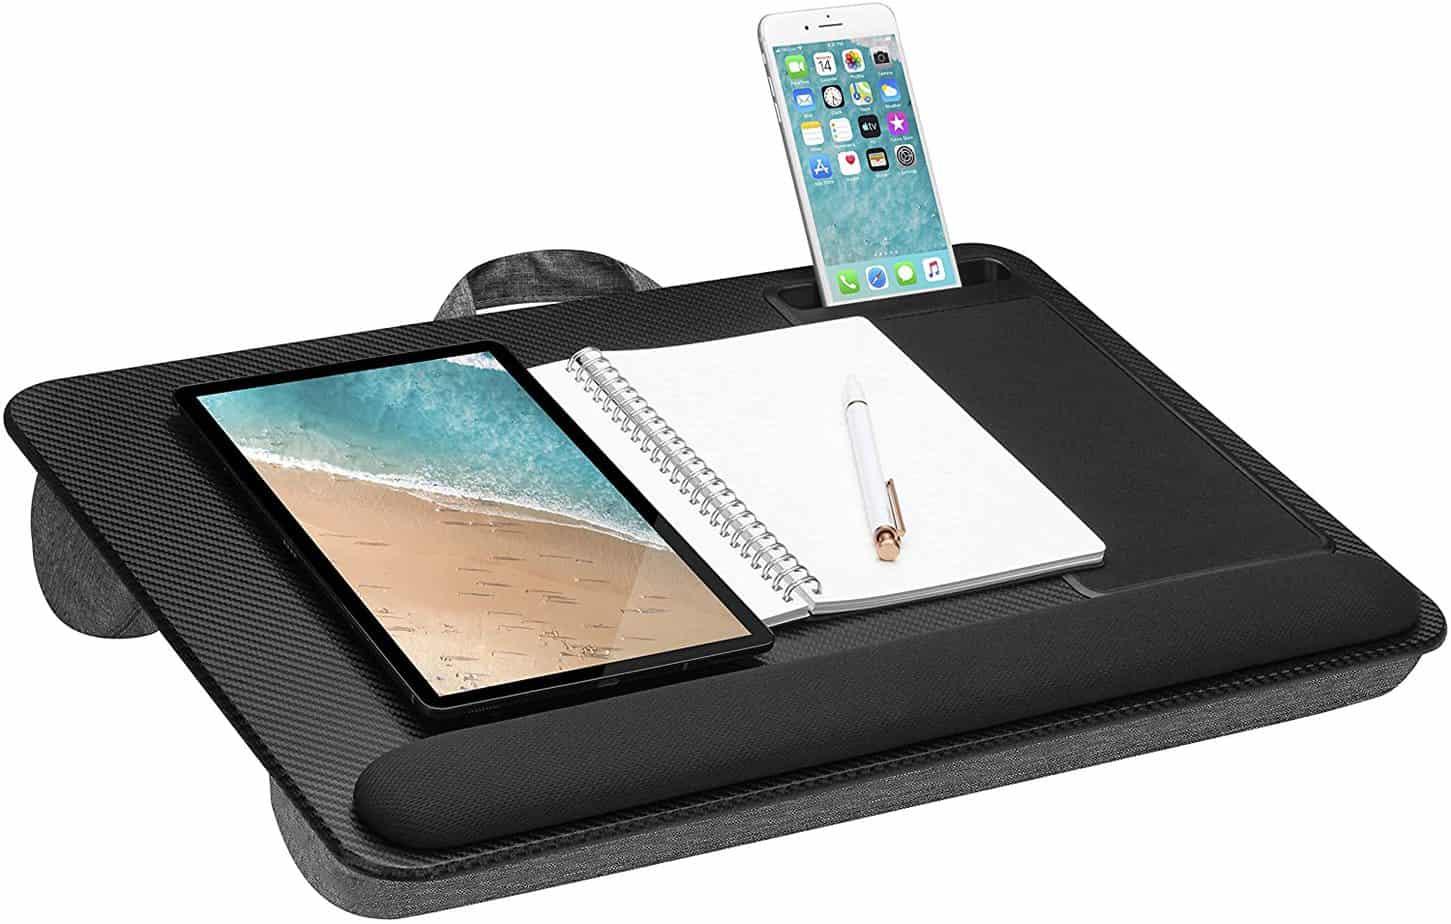 LapGear Home Office Pro Lap Desk with Wrist Rest